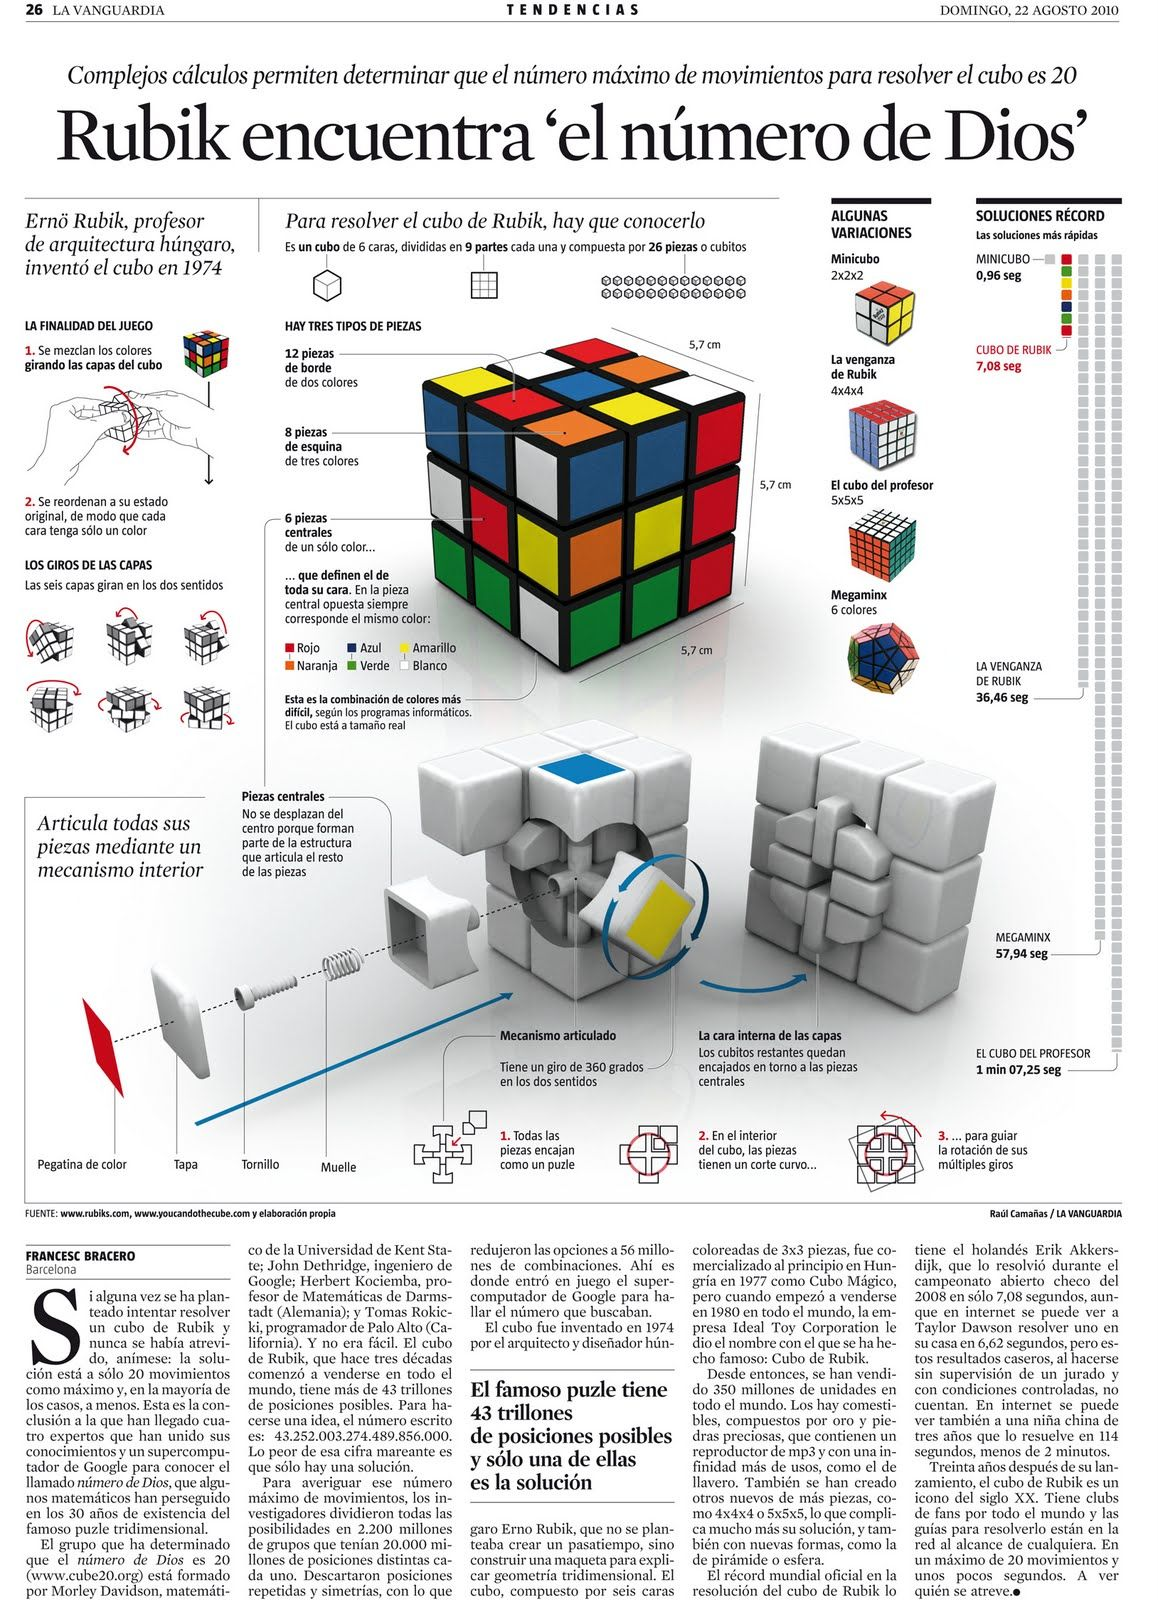 Pin De Diega Dzi En Tutorials And Infographics Inspiration Cubo Rubik Infografias Creativas Rubik